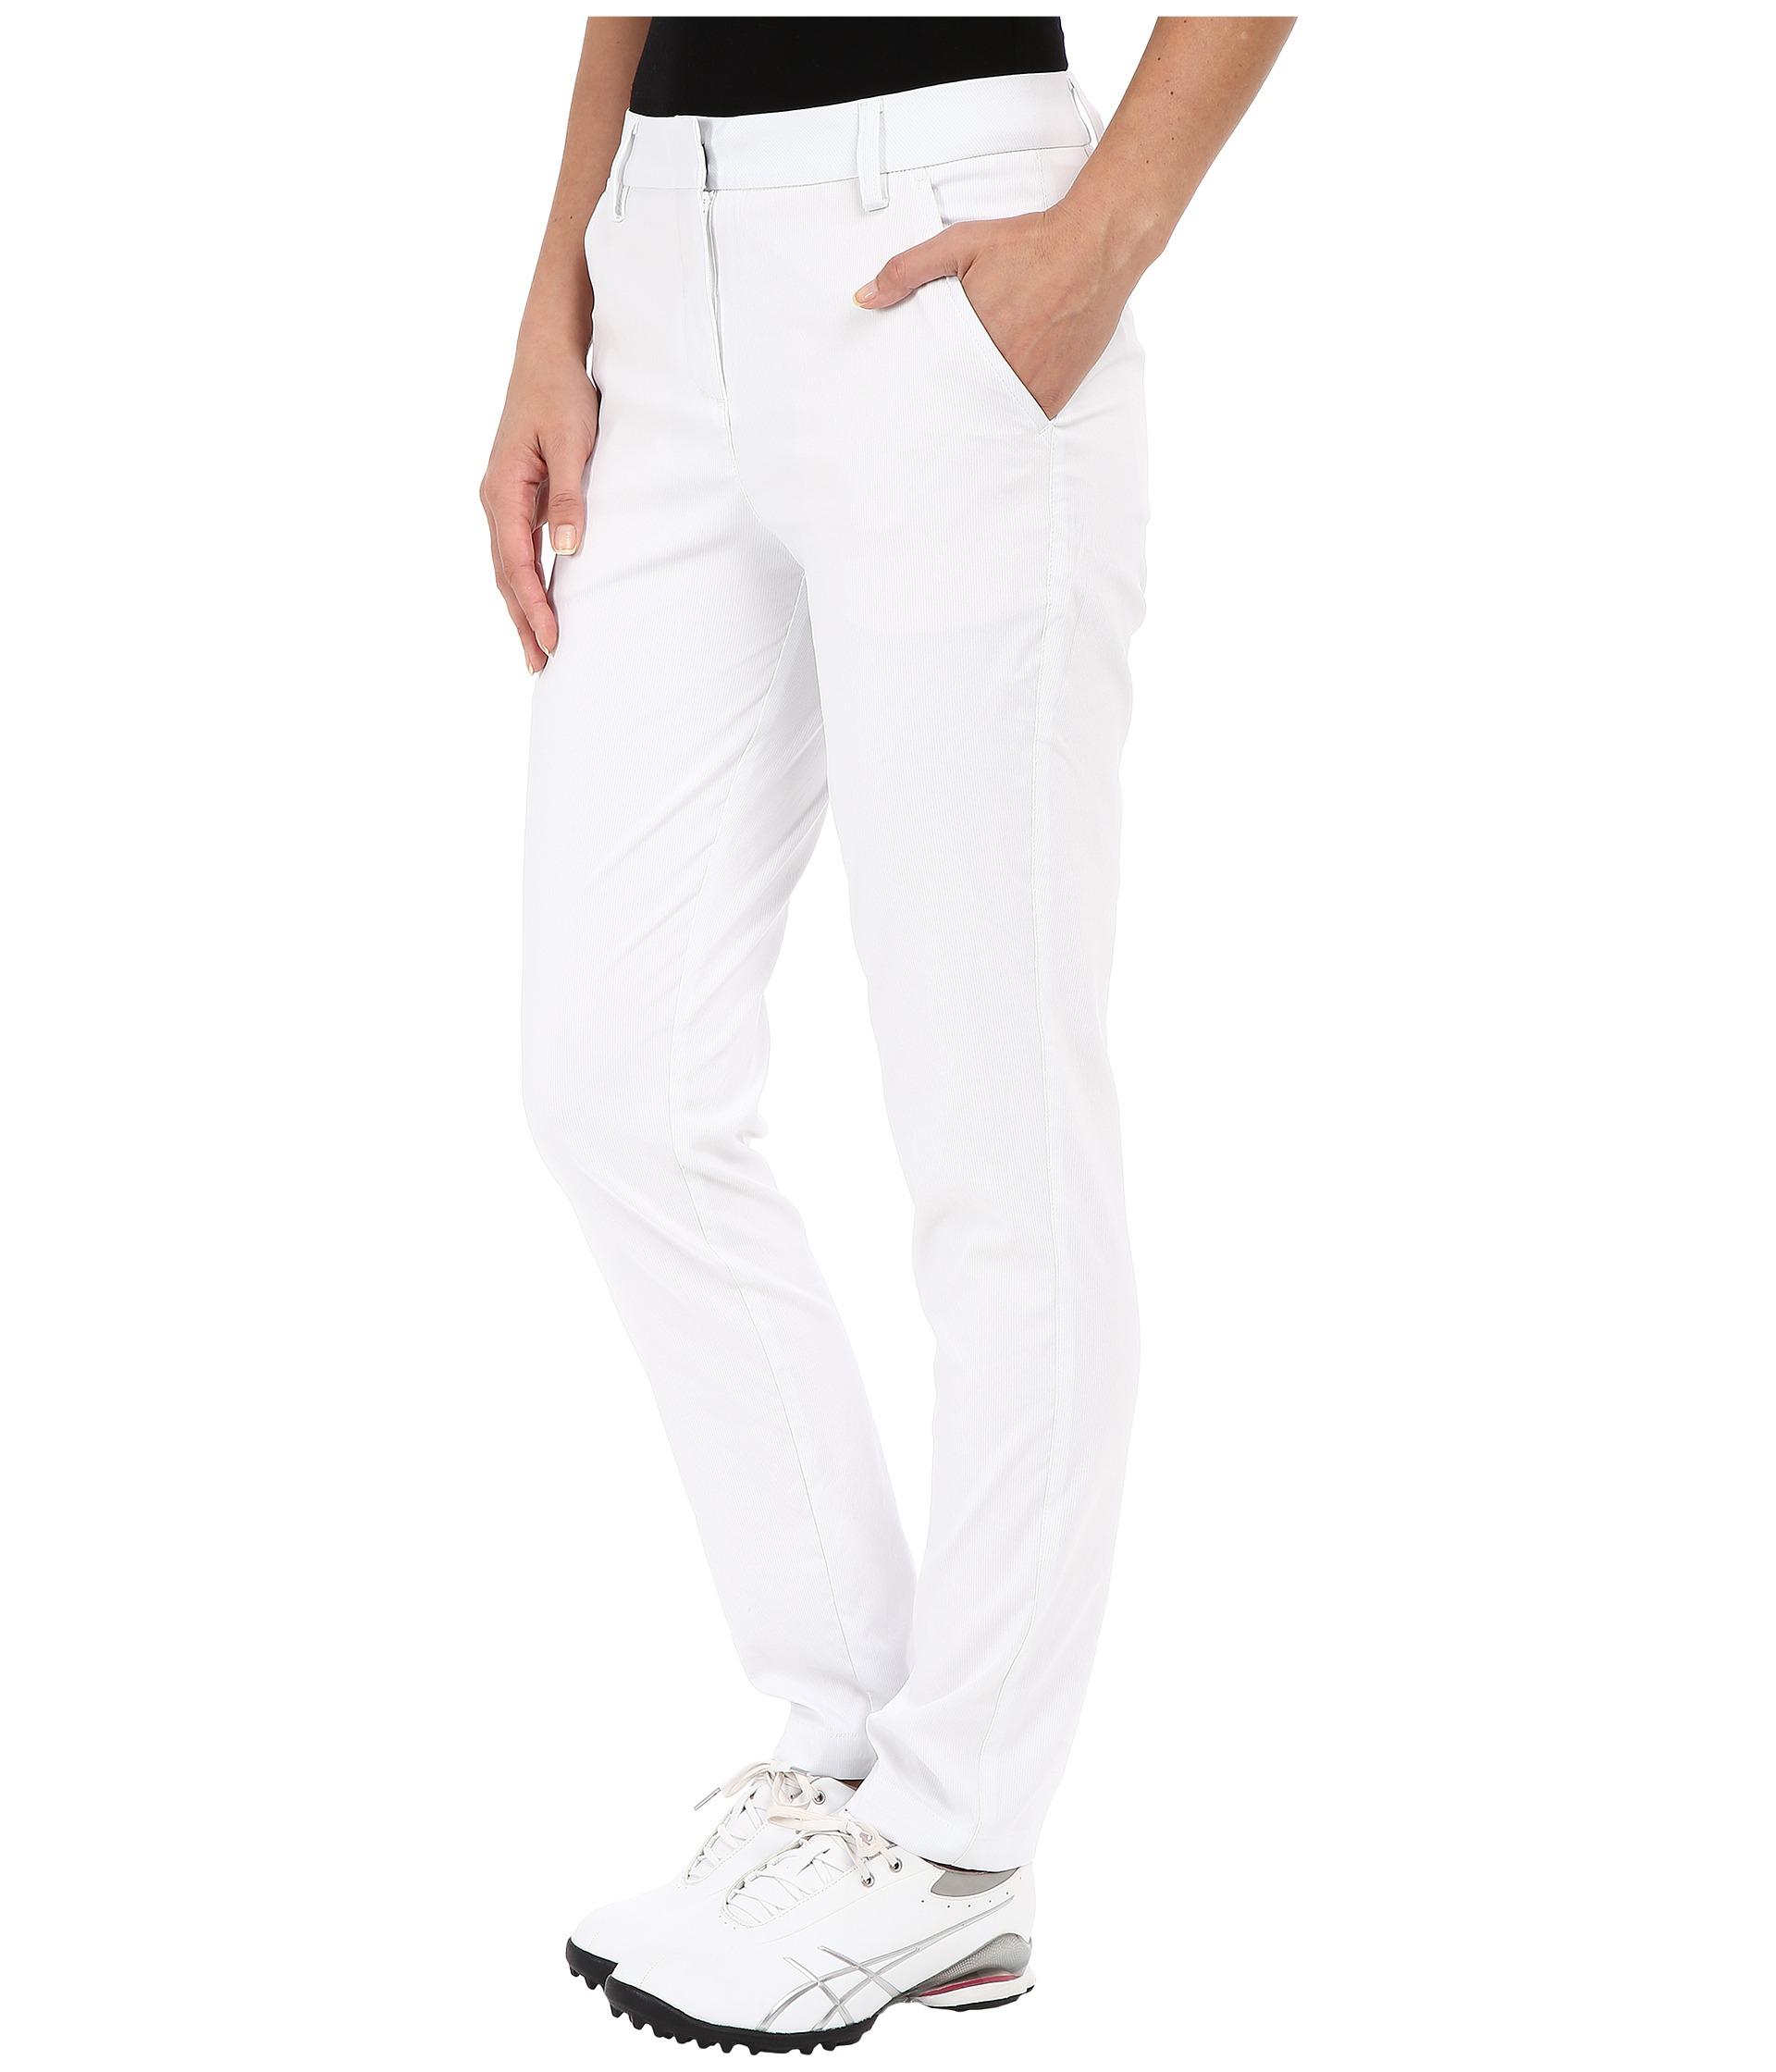 fbd19827d2ca Lyst - PUMA Pounce Pants in White